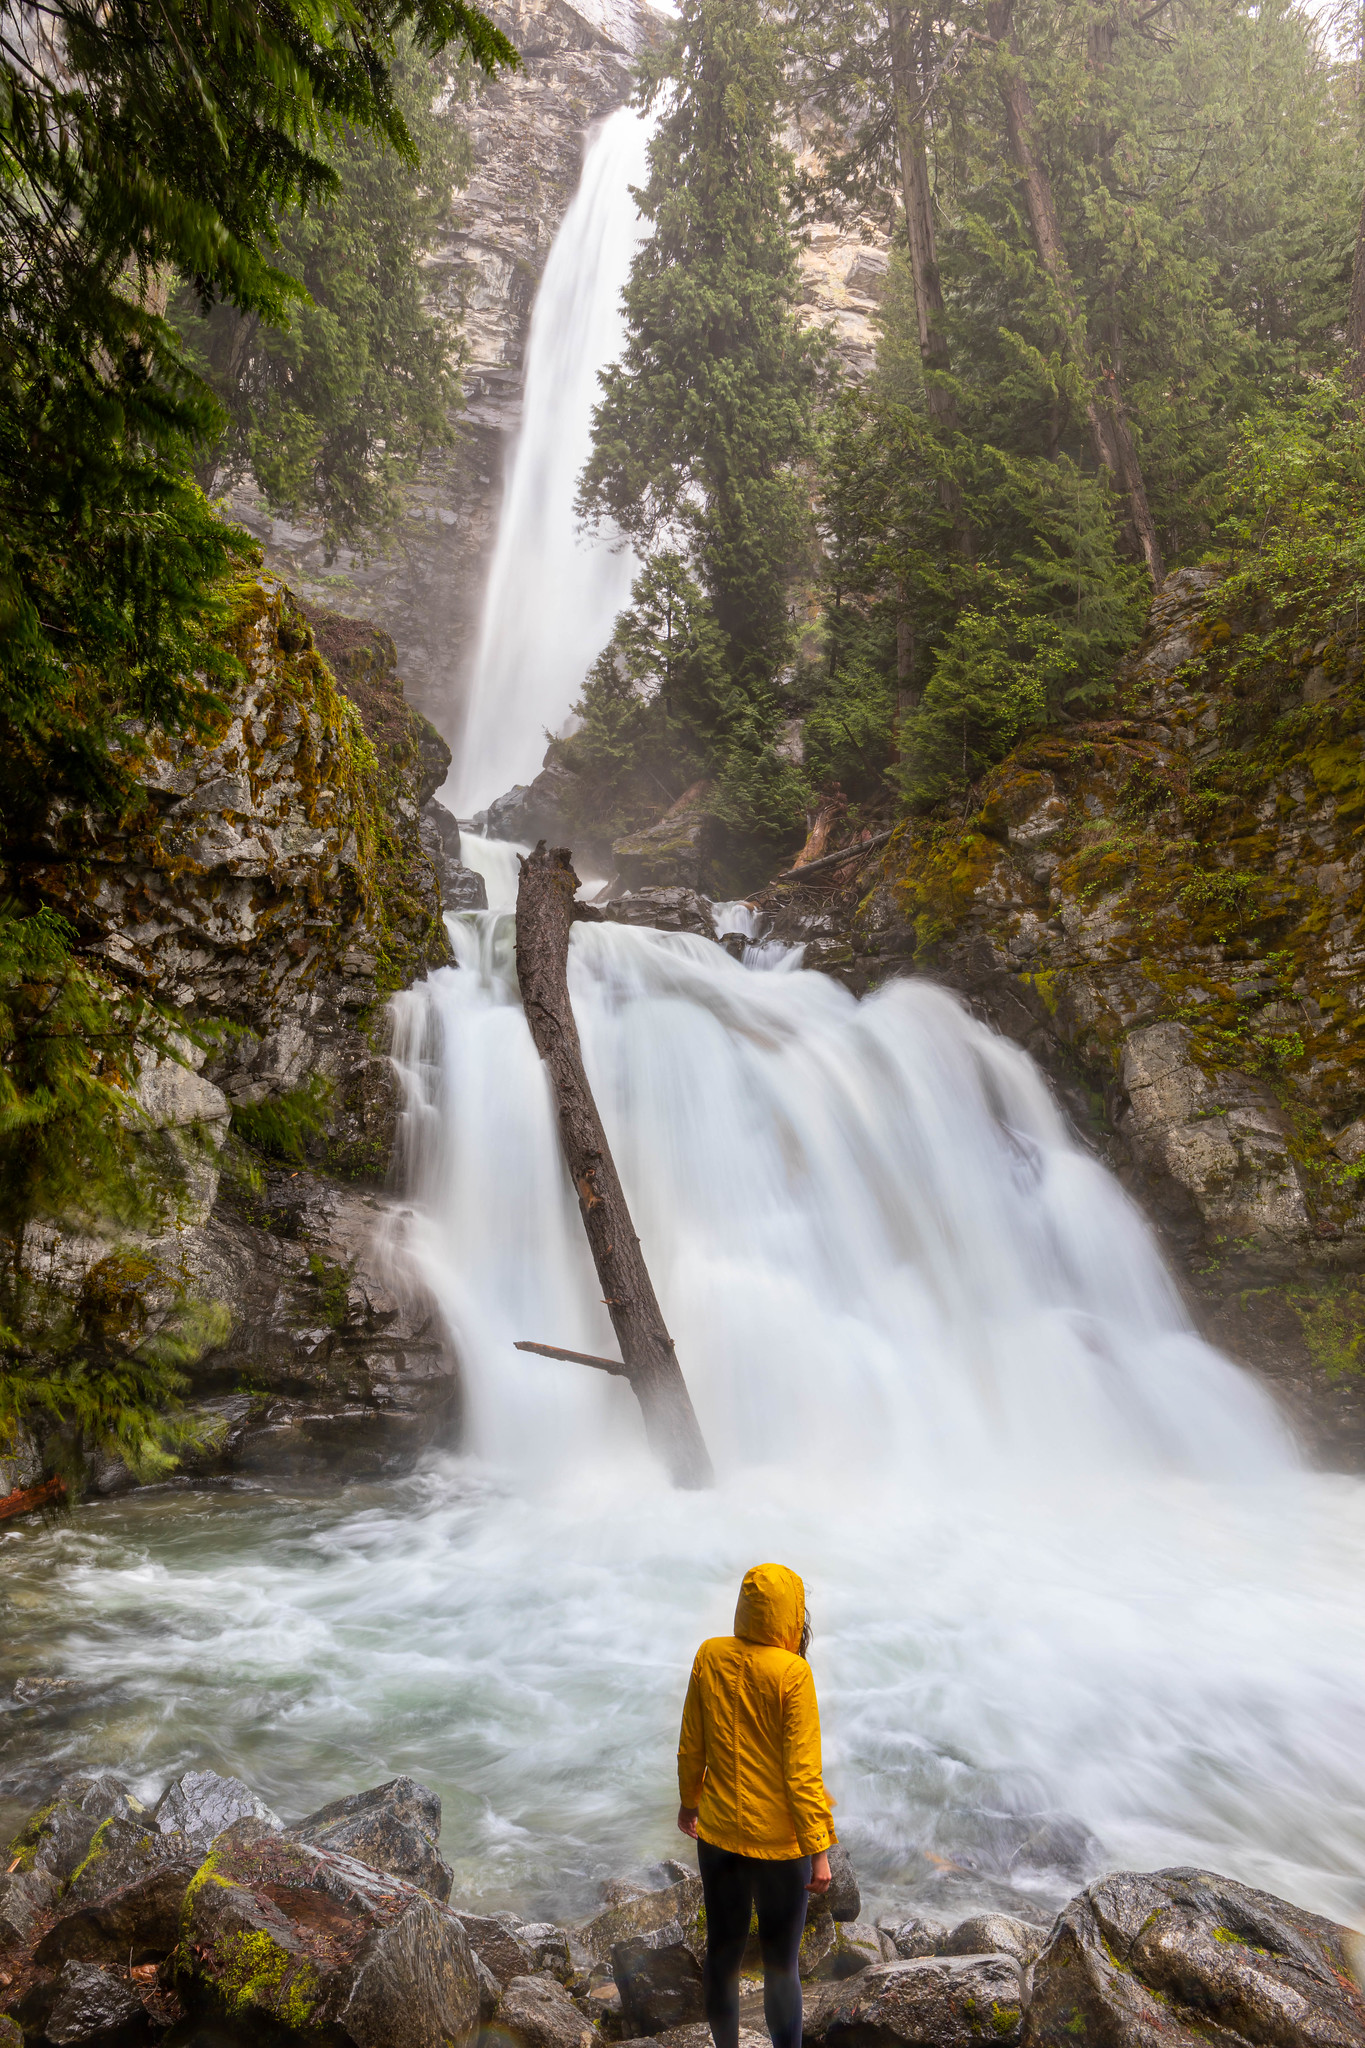 05.26. North Cascades. Stehekin: Rainbow Falls